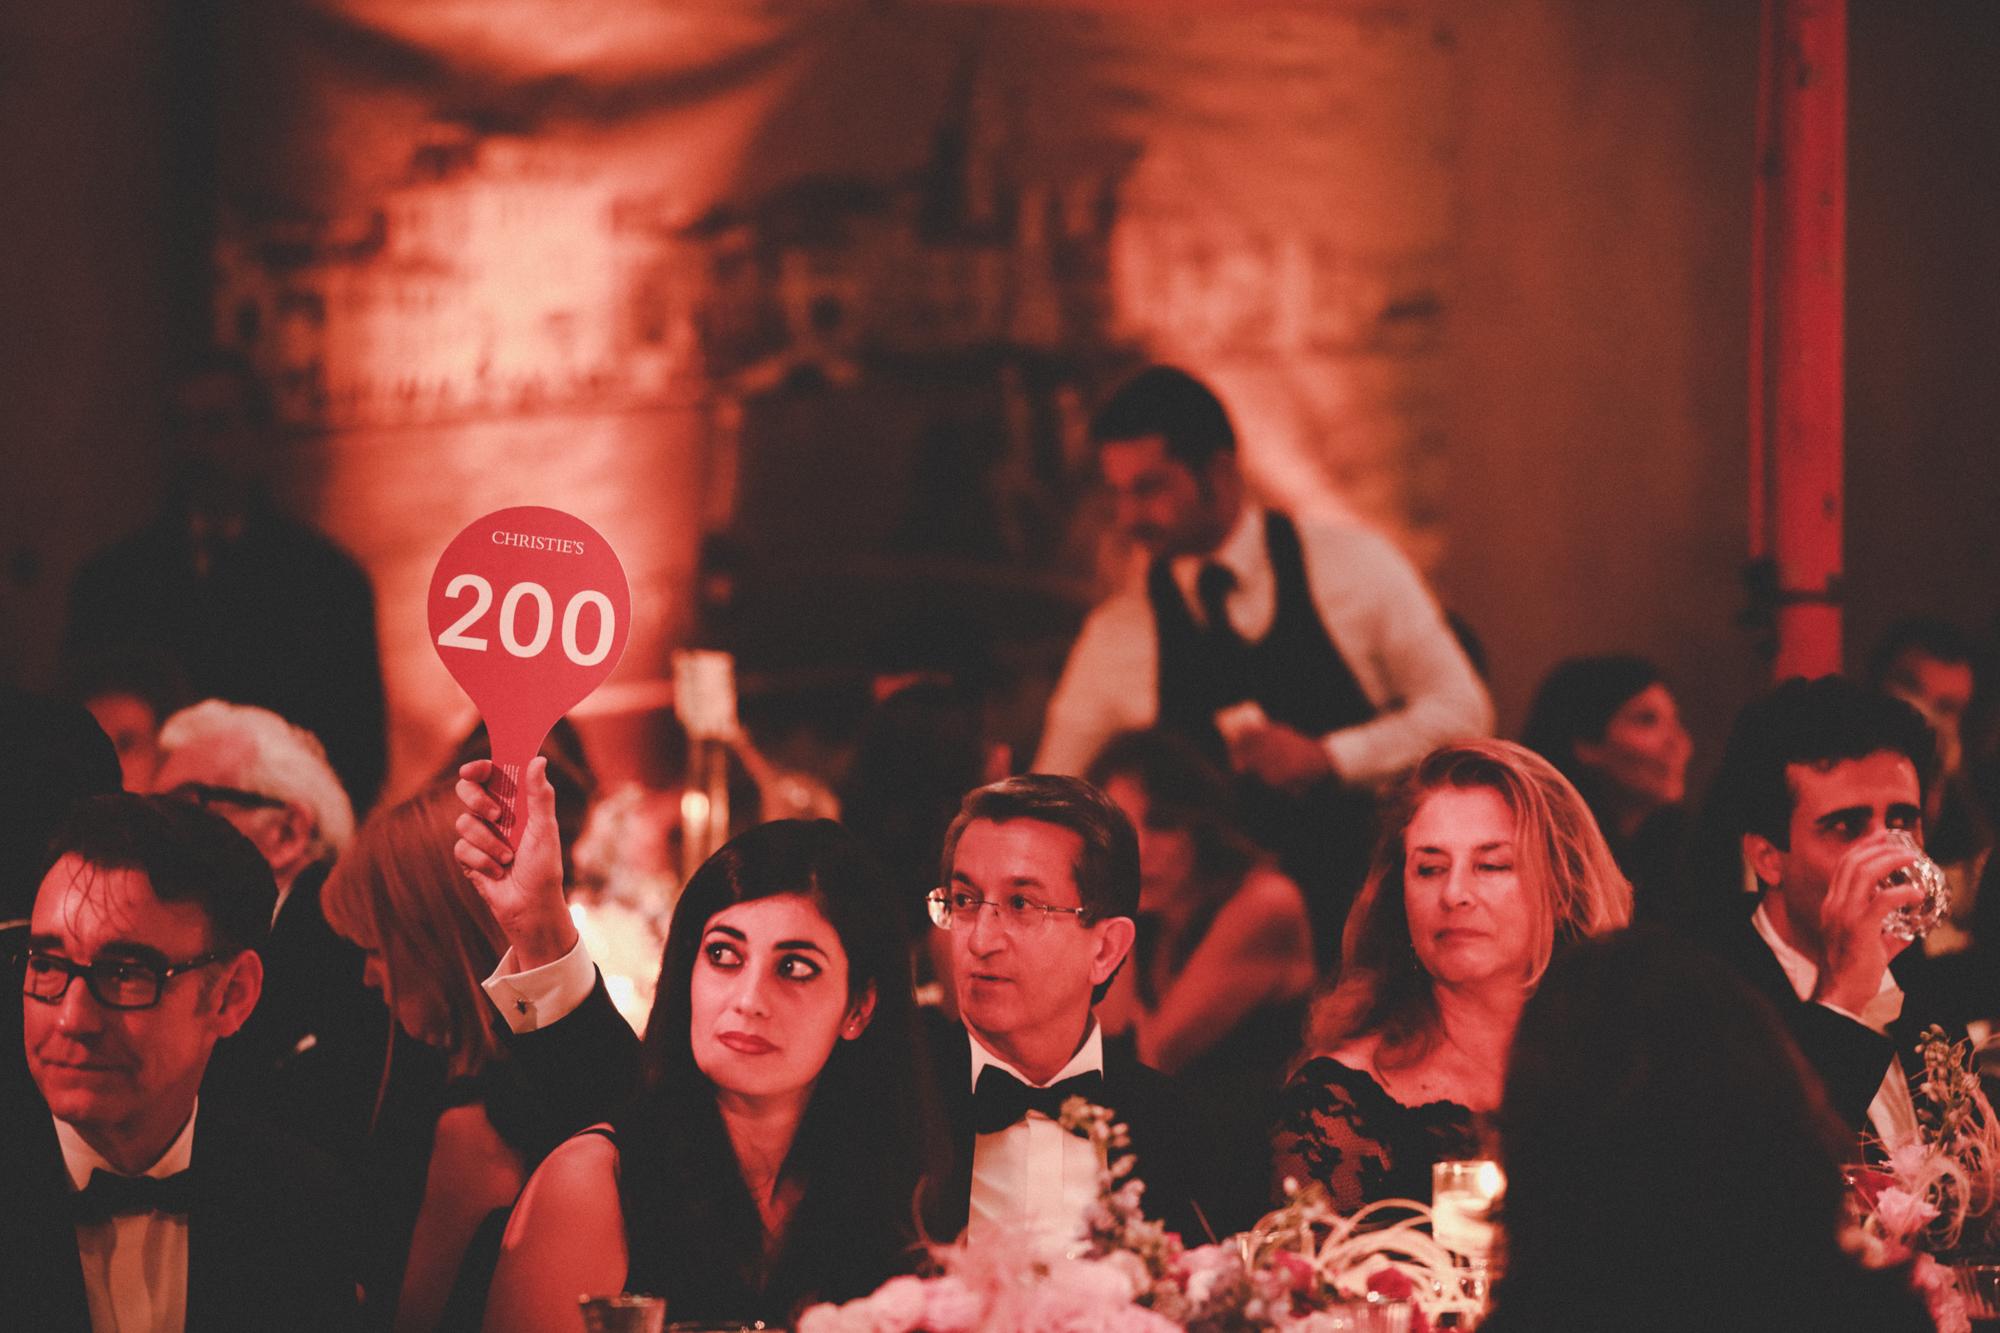 Martin Schneider-Lenne & Verena Pfeiffer, Gulshat Uzenbaeva, Roberta de Paoli, Alexandra della Porta, Gianfrancesco Beltrami & his companion, Gabriel Licari